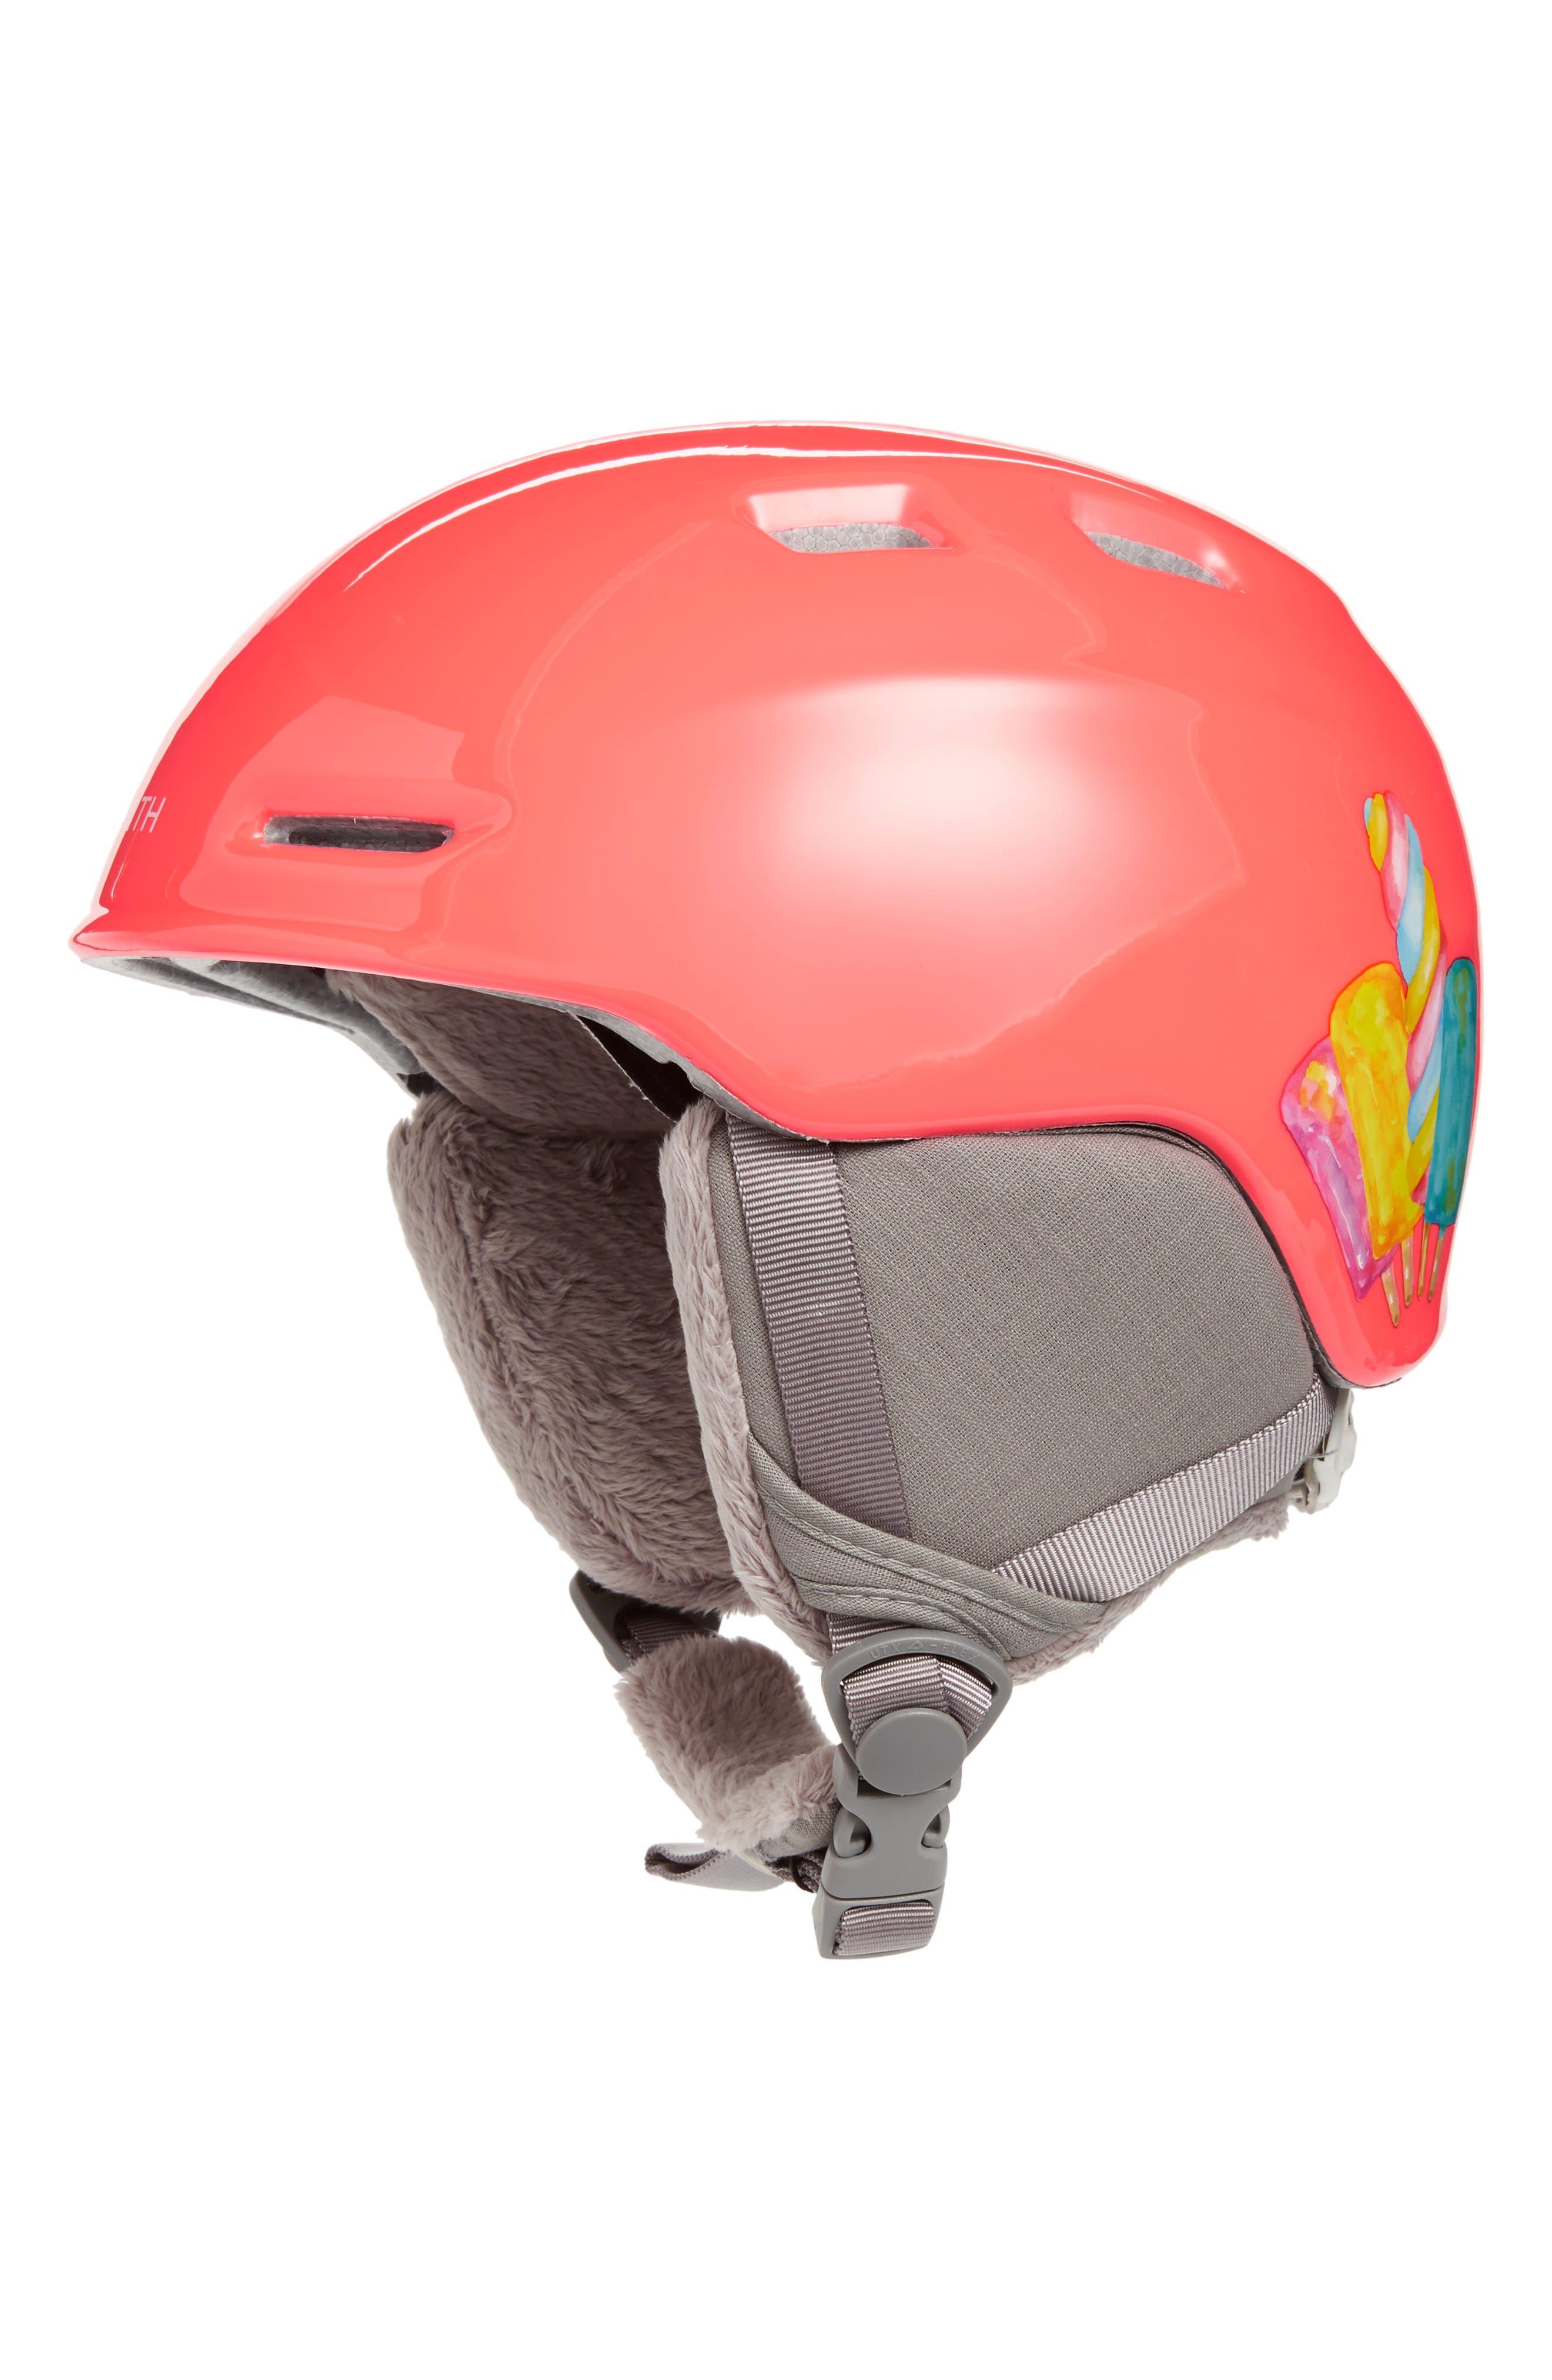 Alternate Image 1 Selected - Smith 'Zoom Jr.' Snow Helmet (Juniors)